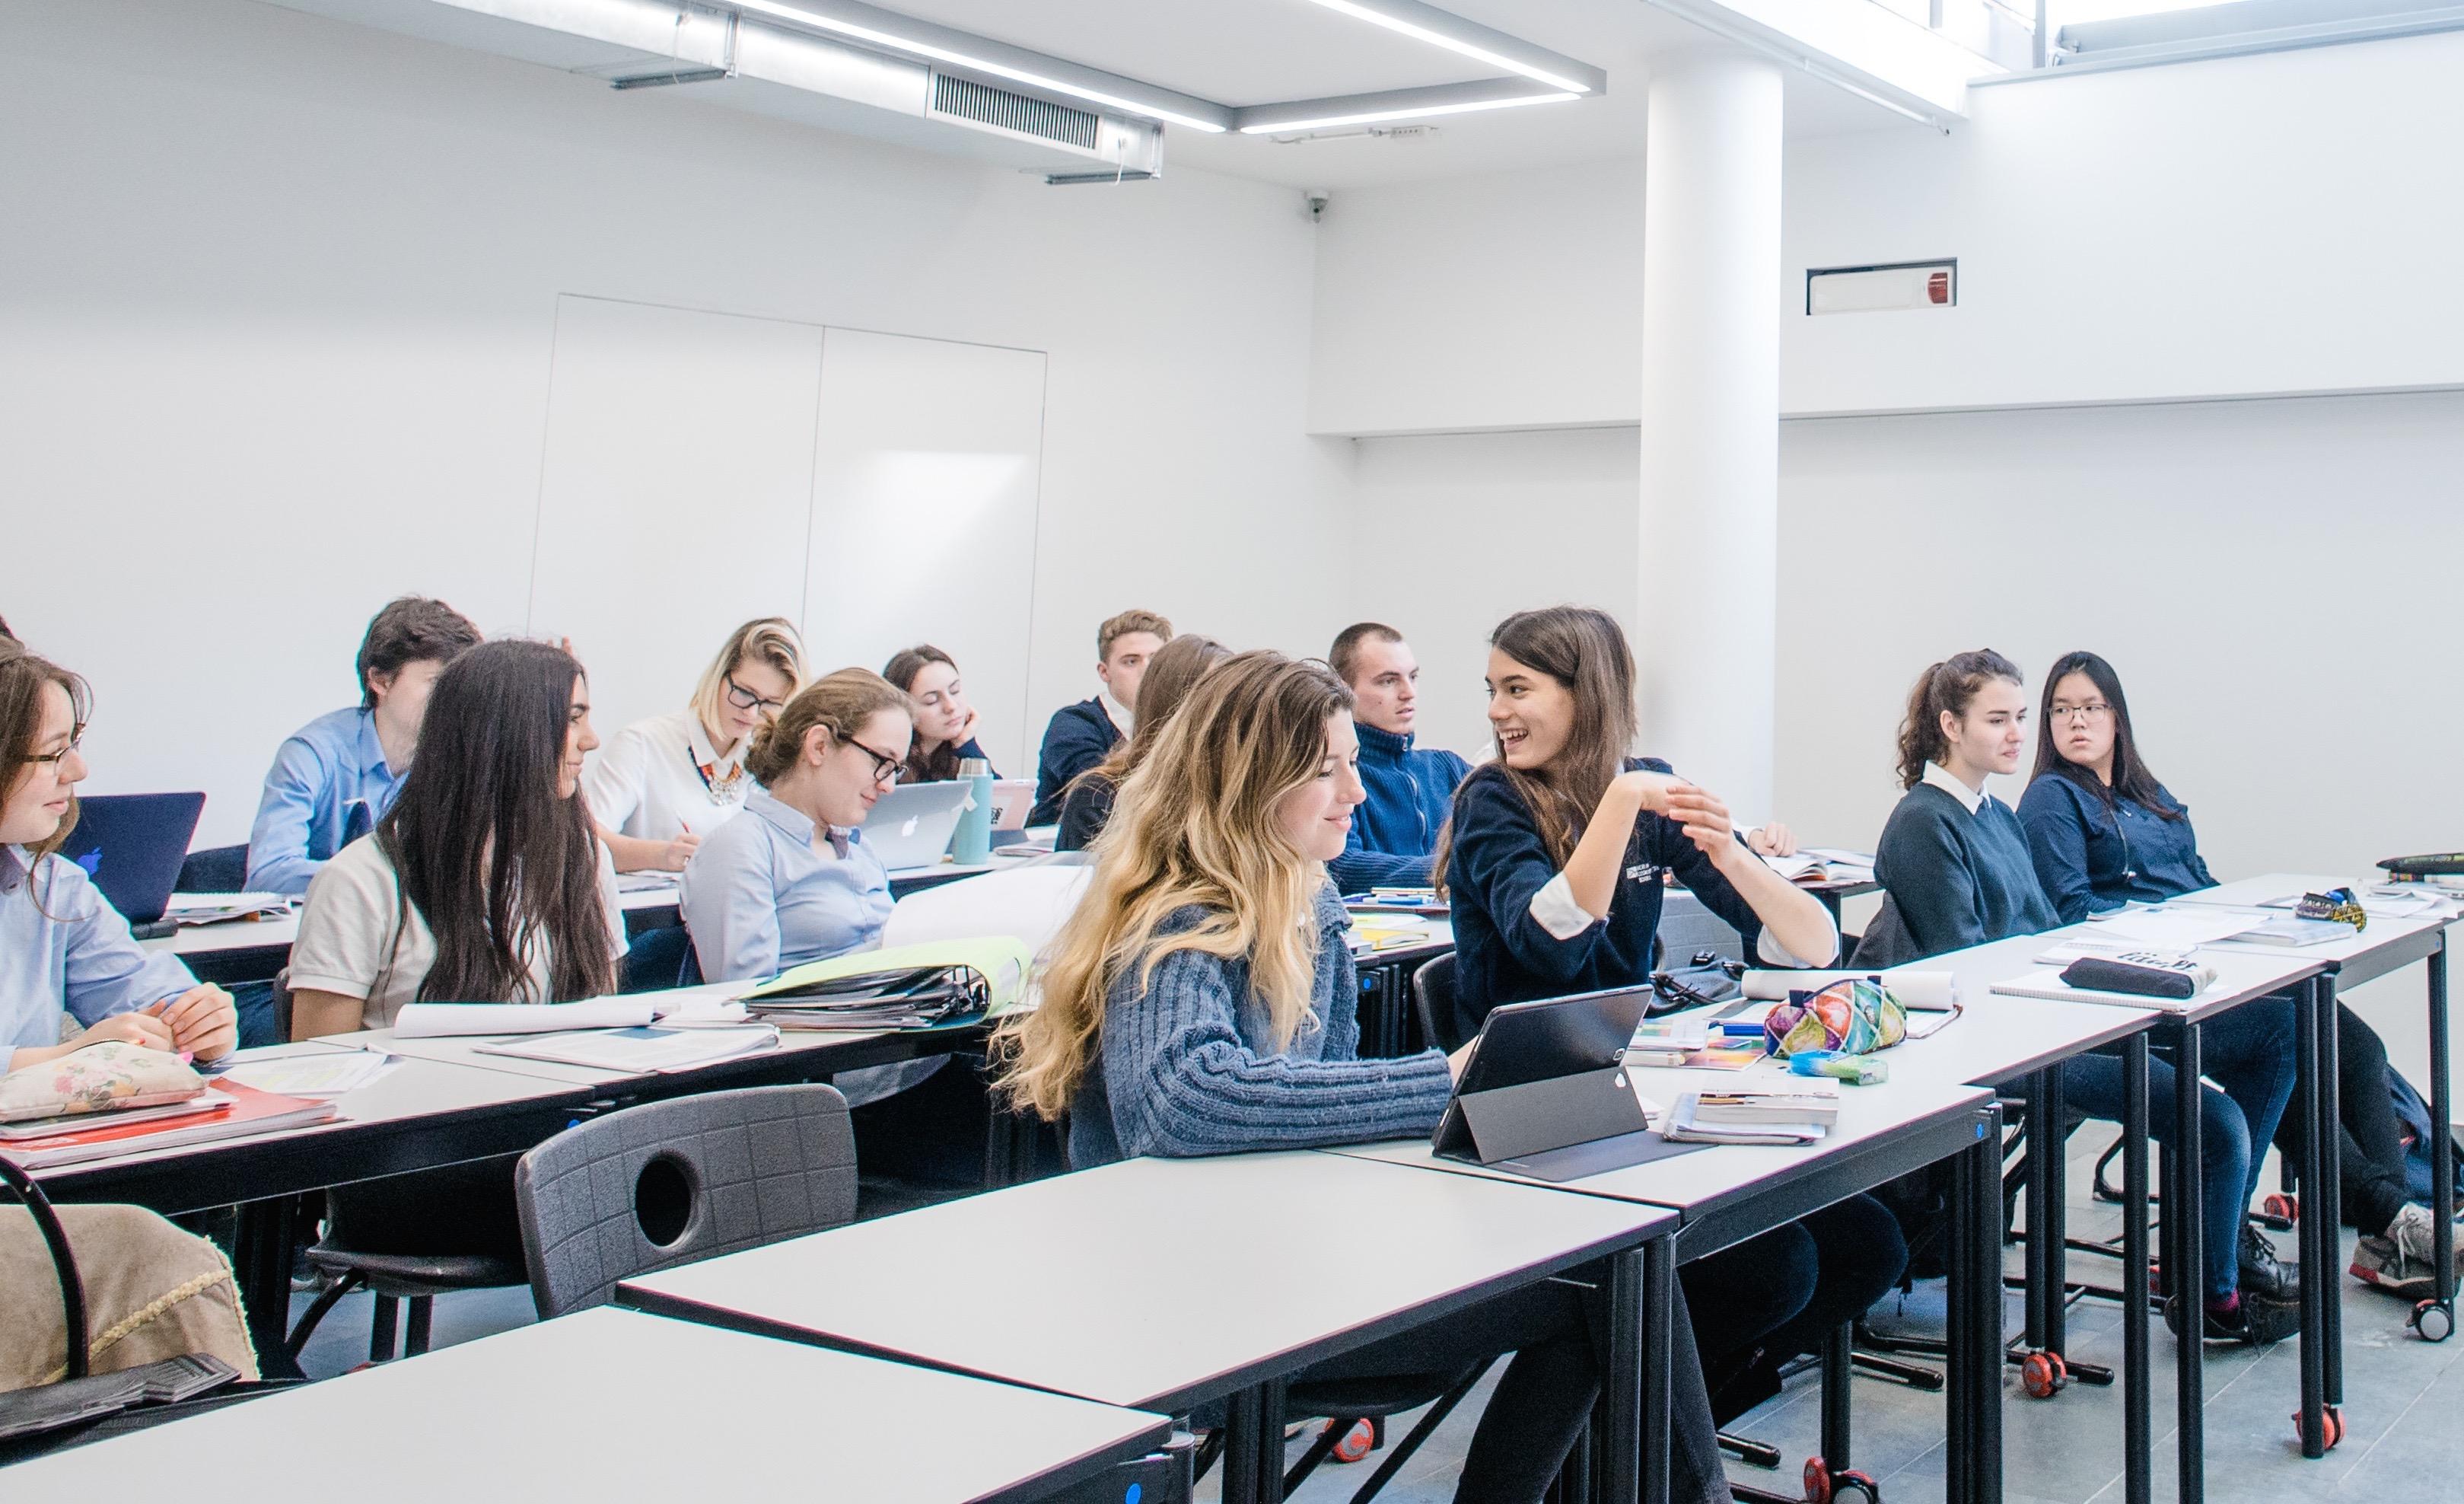 bilingual abitur scholarships berlin cosmopolitan school. Black Bedroom Furniture Sets. Home Design Ideas